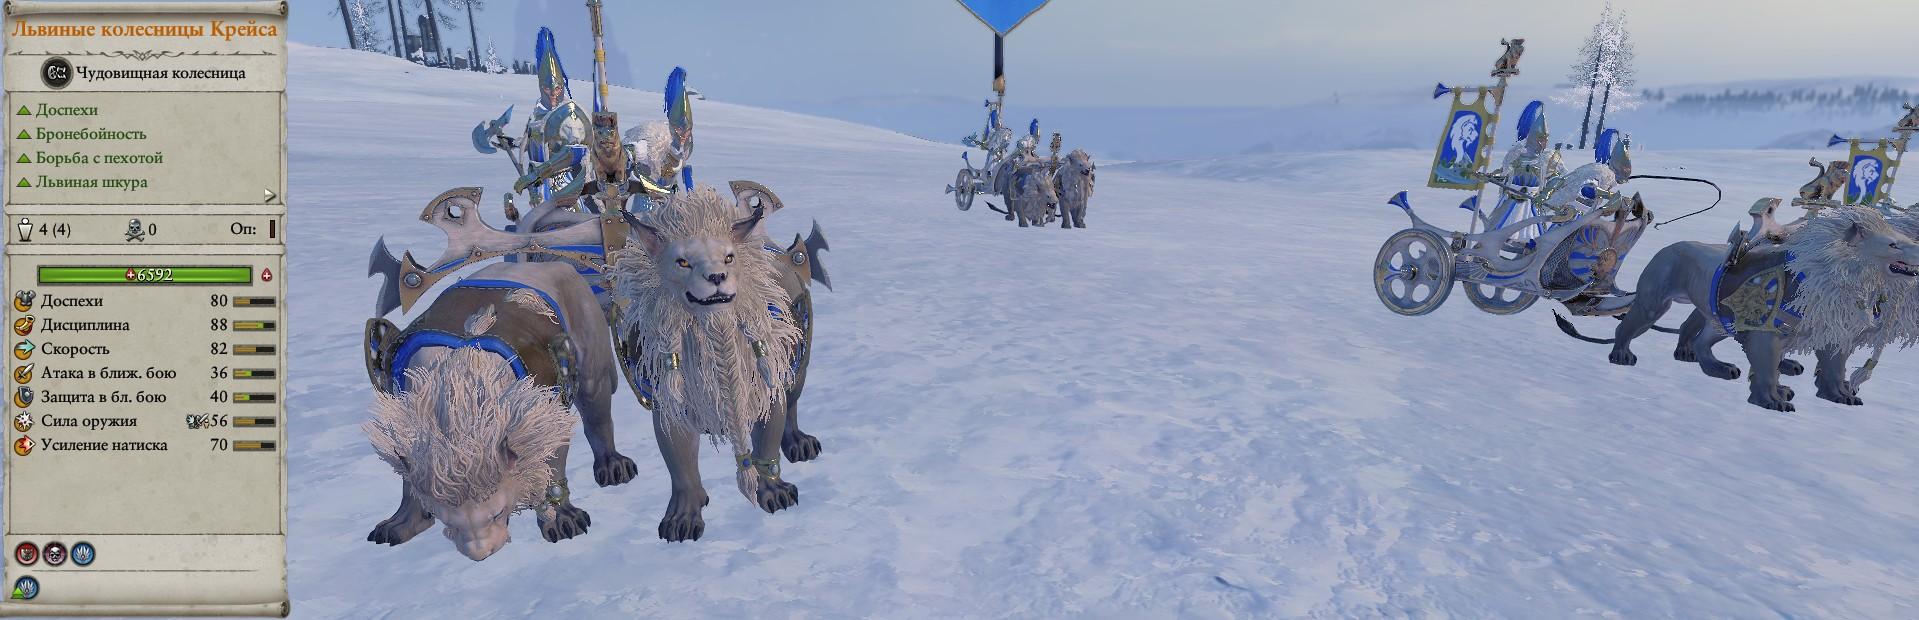 Львиная колесница Крейса отряды warhammer total war 2